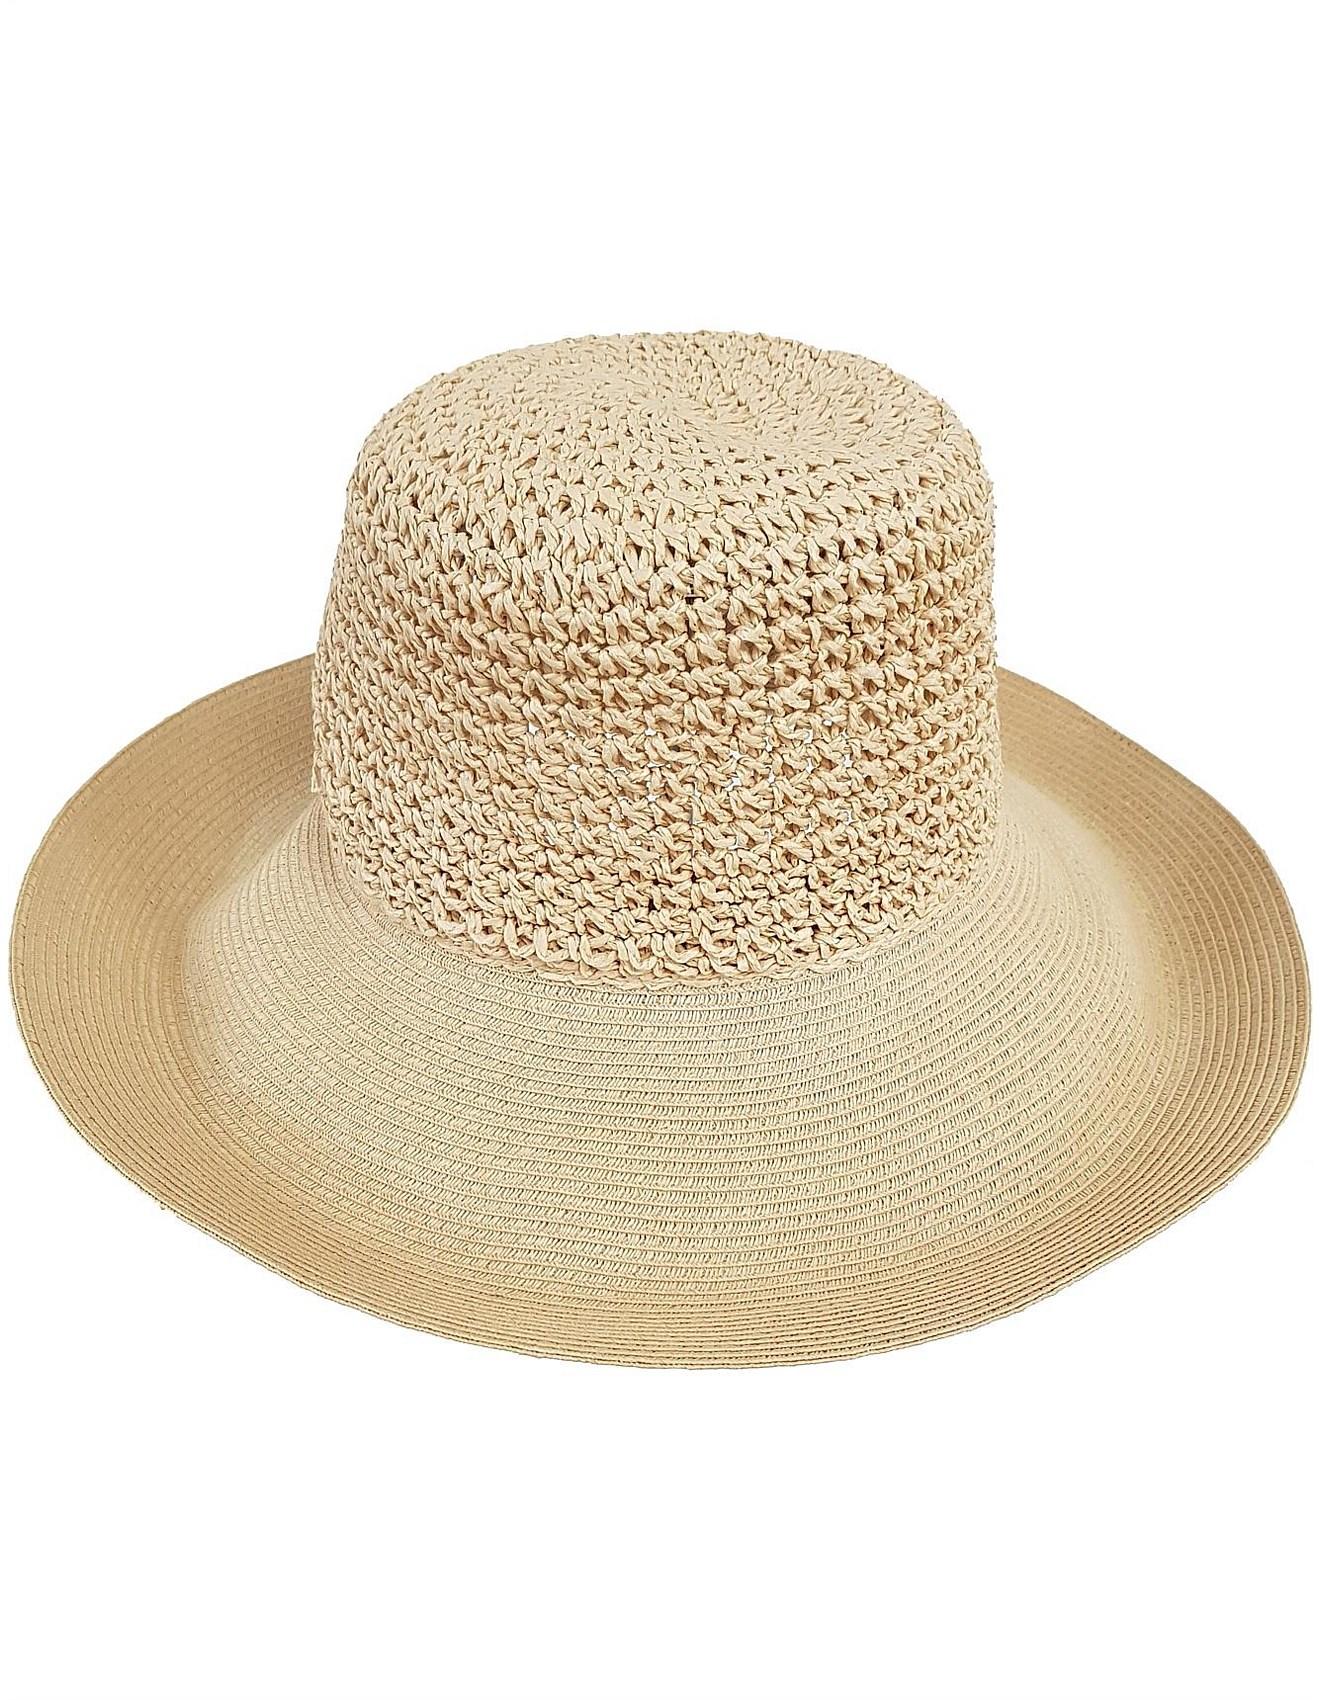 Women - FOLDABLE SUN HAT WITH ADJUSTABLE BRIM c0c4b379605